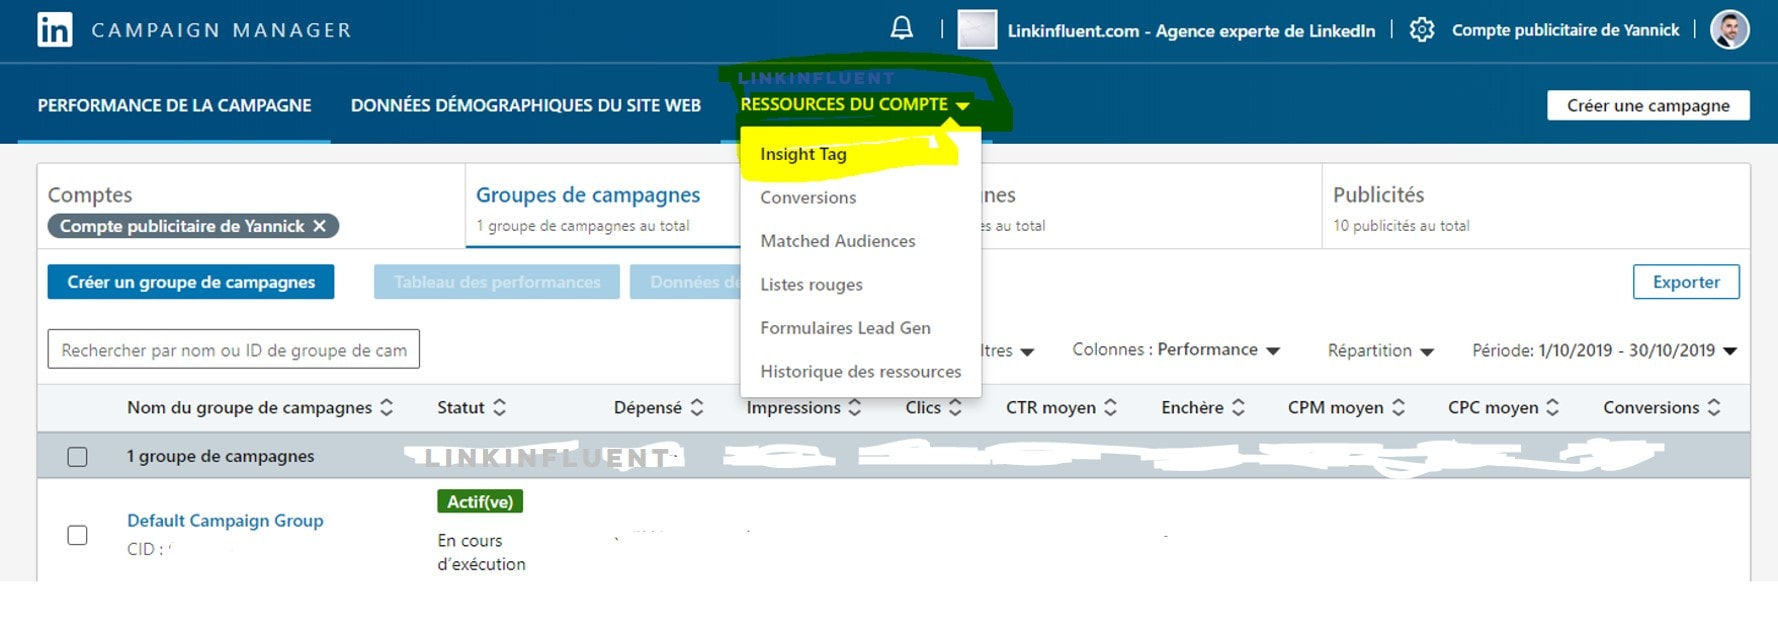 Tutoriel d'installation du Pixel LinkedIn (LinkedIn insight tag) - Etape 3 - Proinfluent